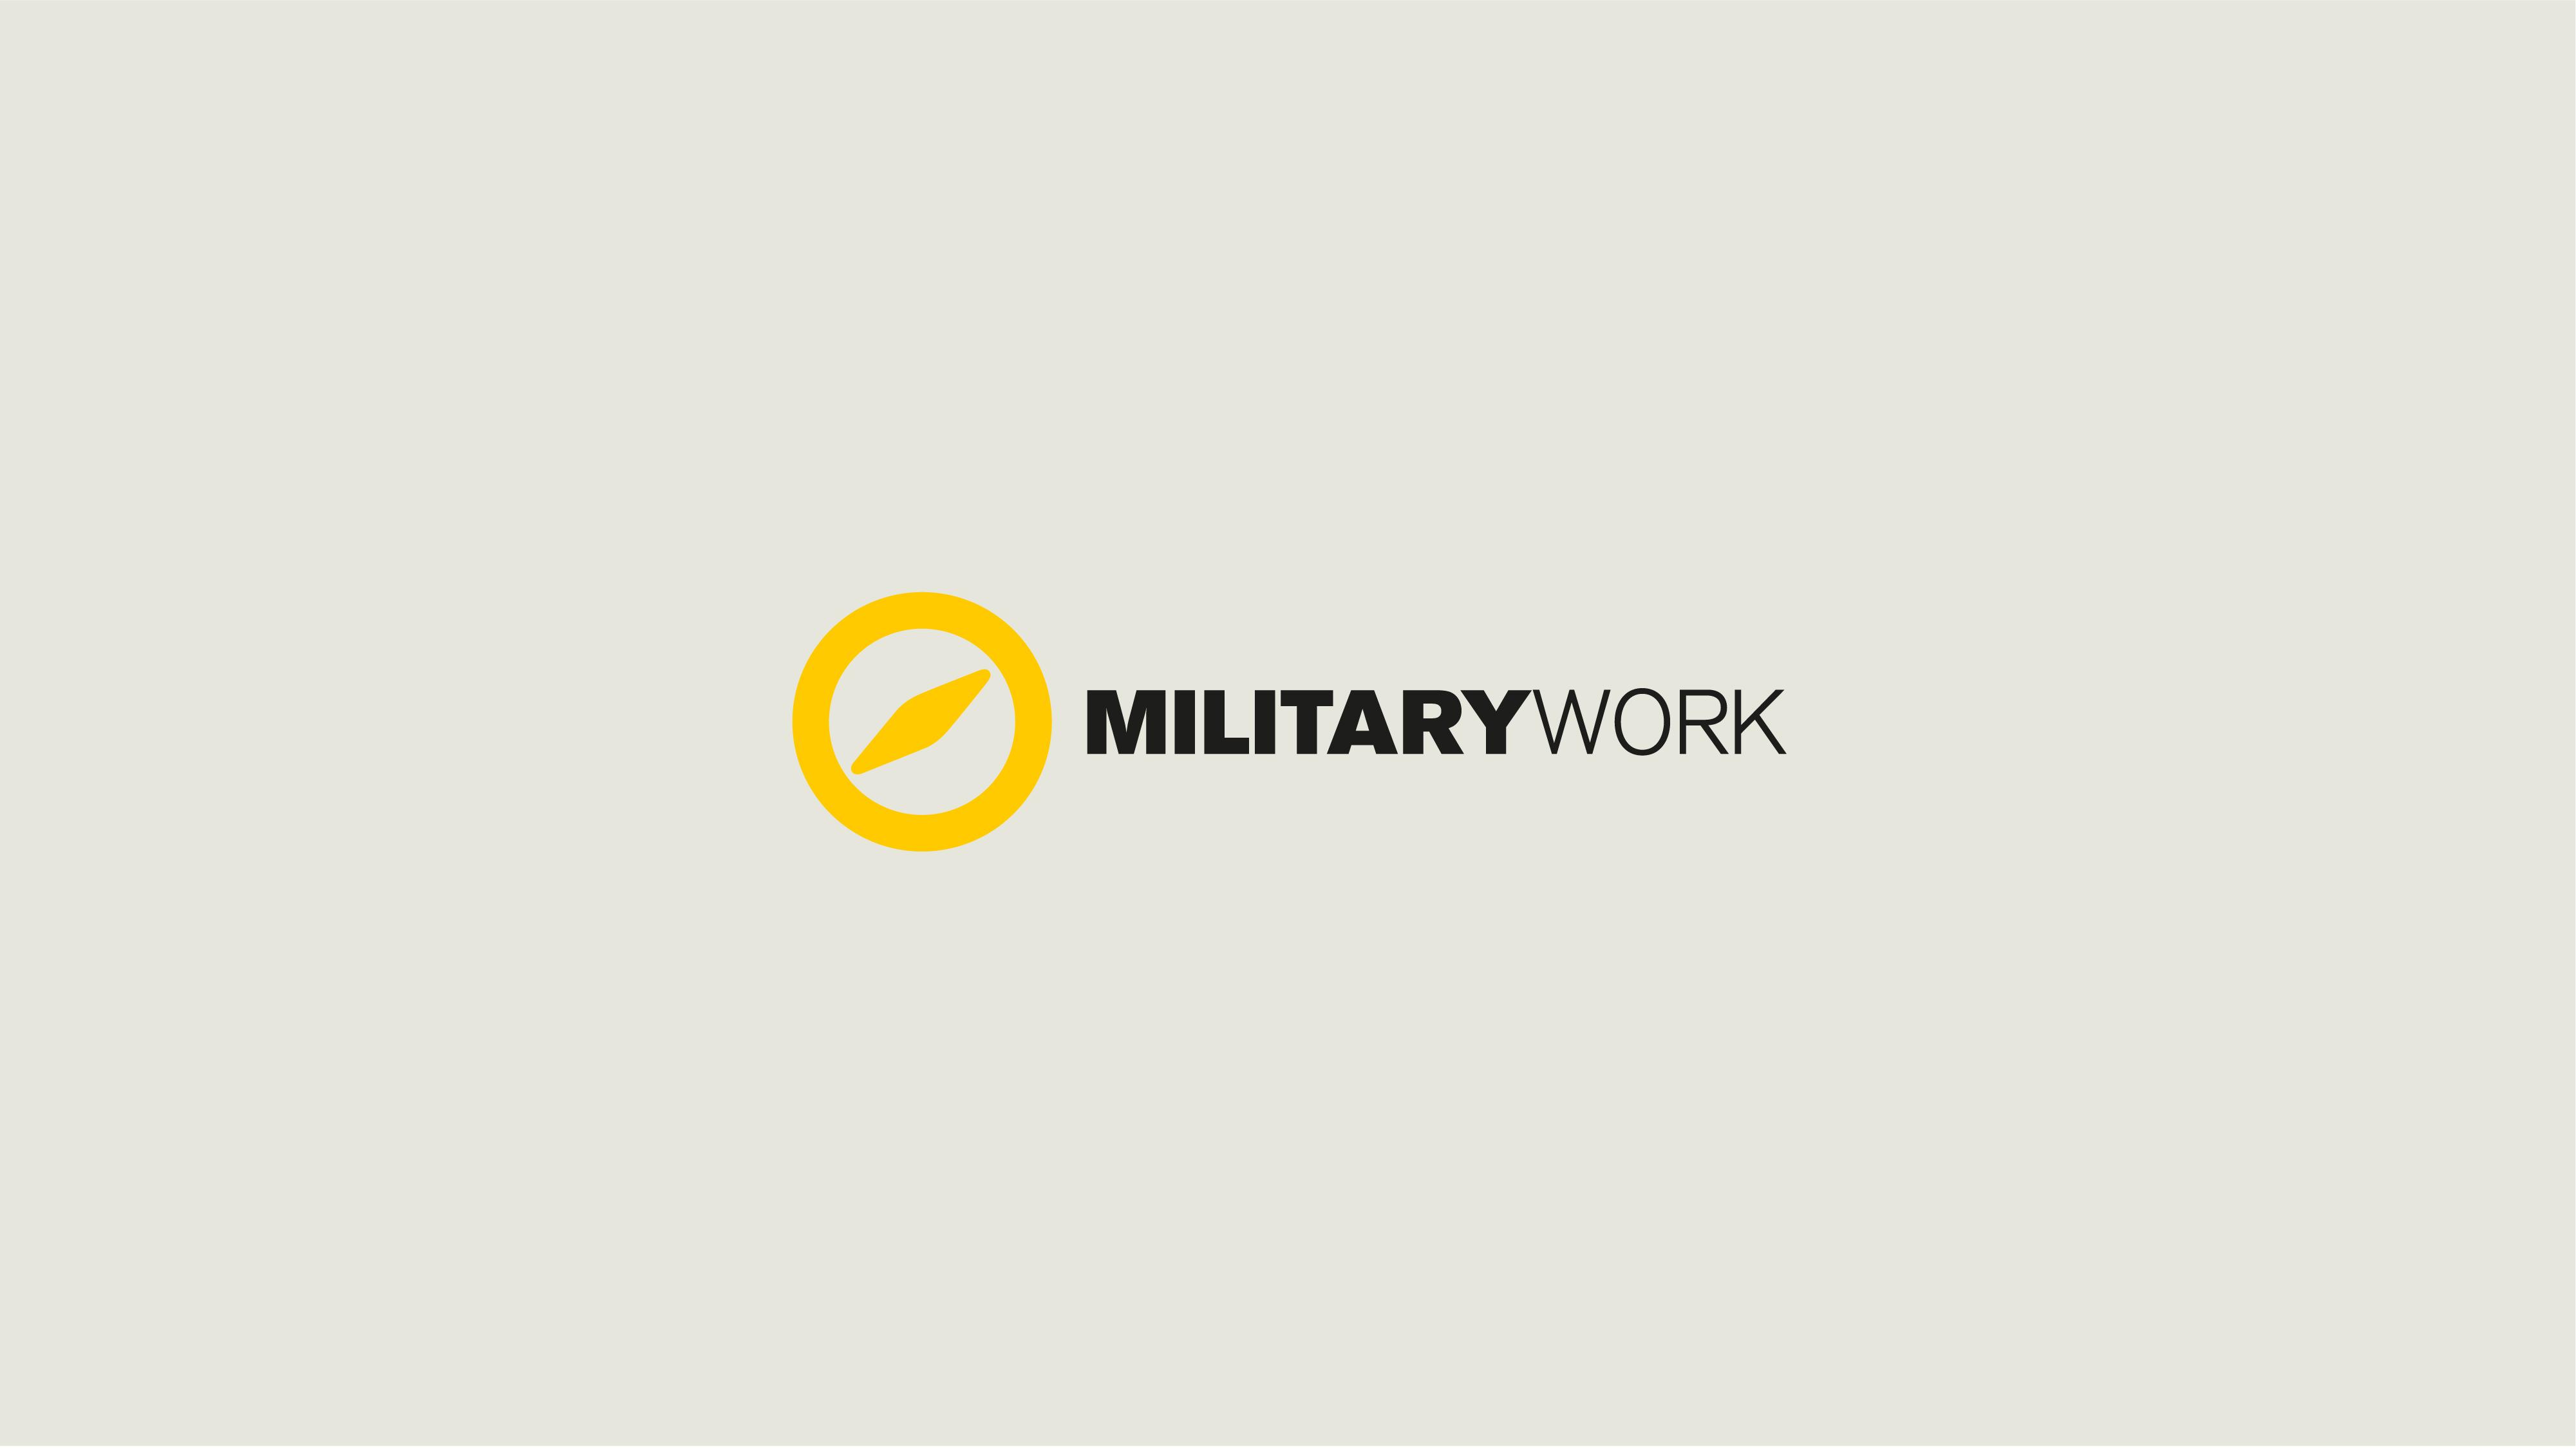 5.0 Military Work Storisell Produktionsbolag Avslut